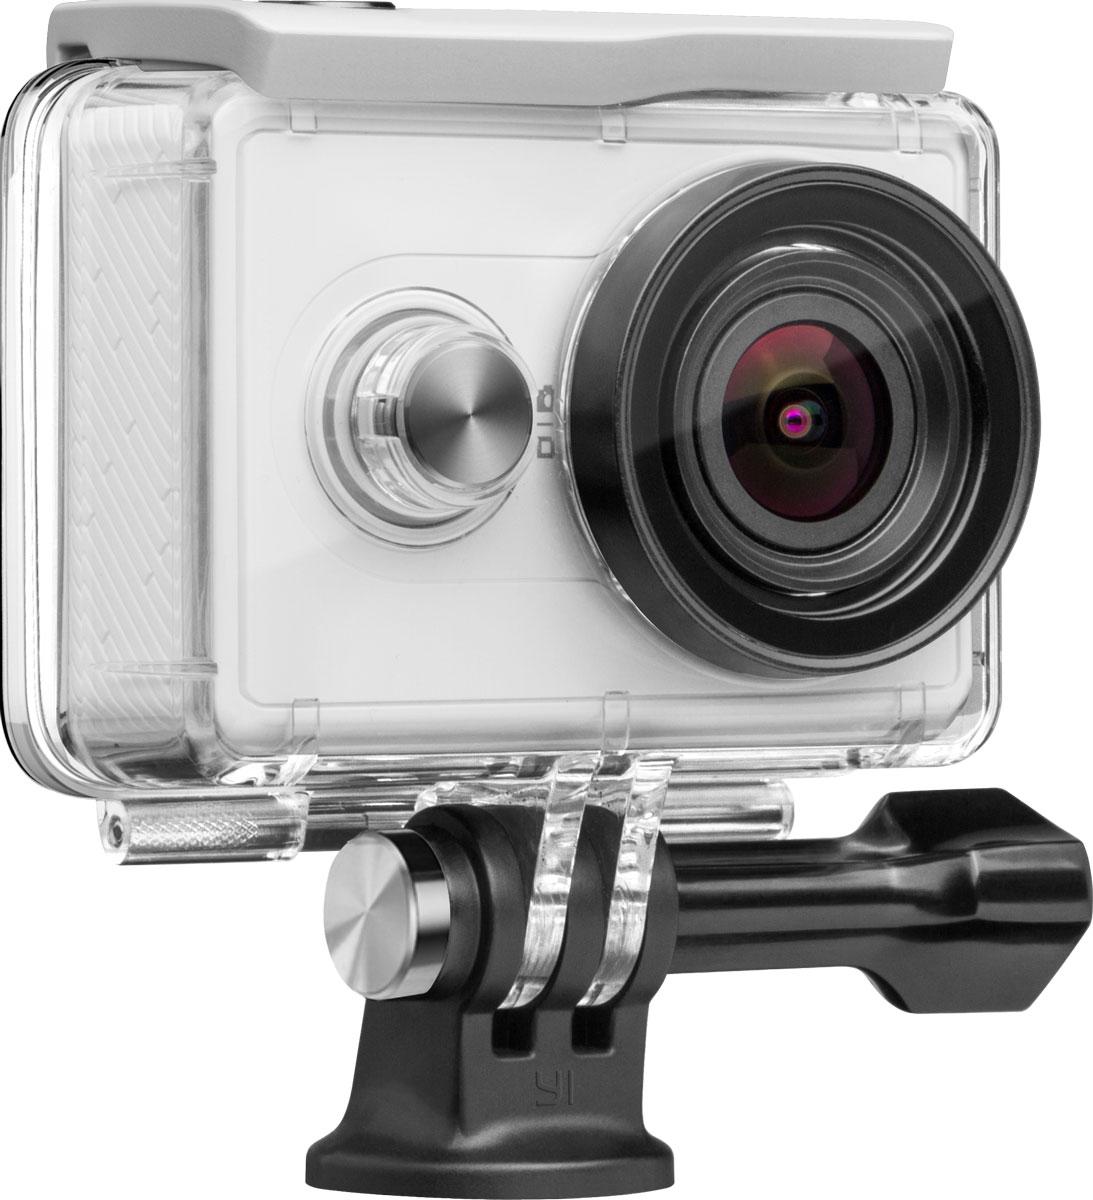 Xiaomi аквабокс для экшн-камеры Yi, White - Фотоаксессуары